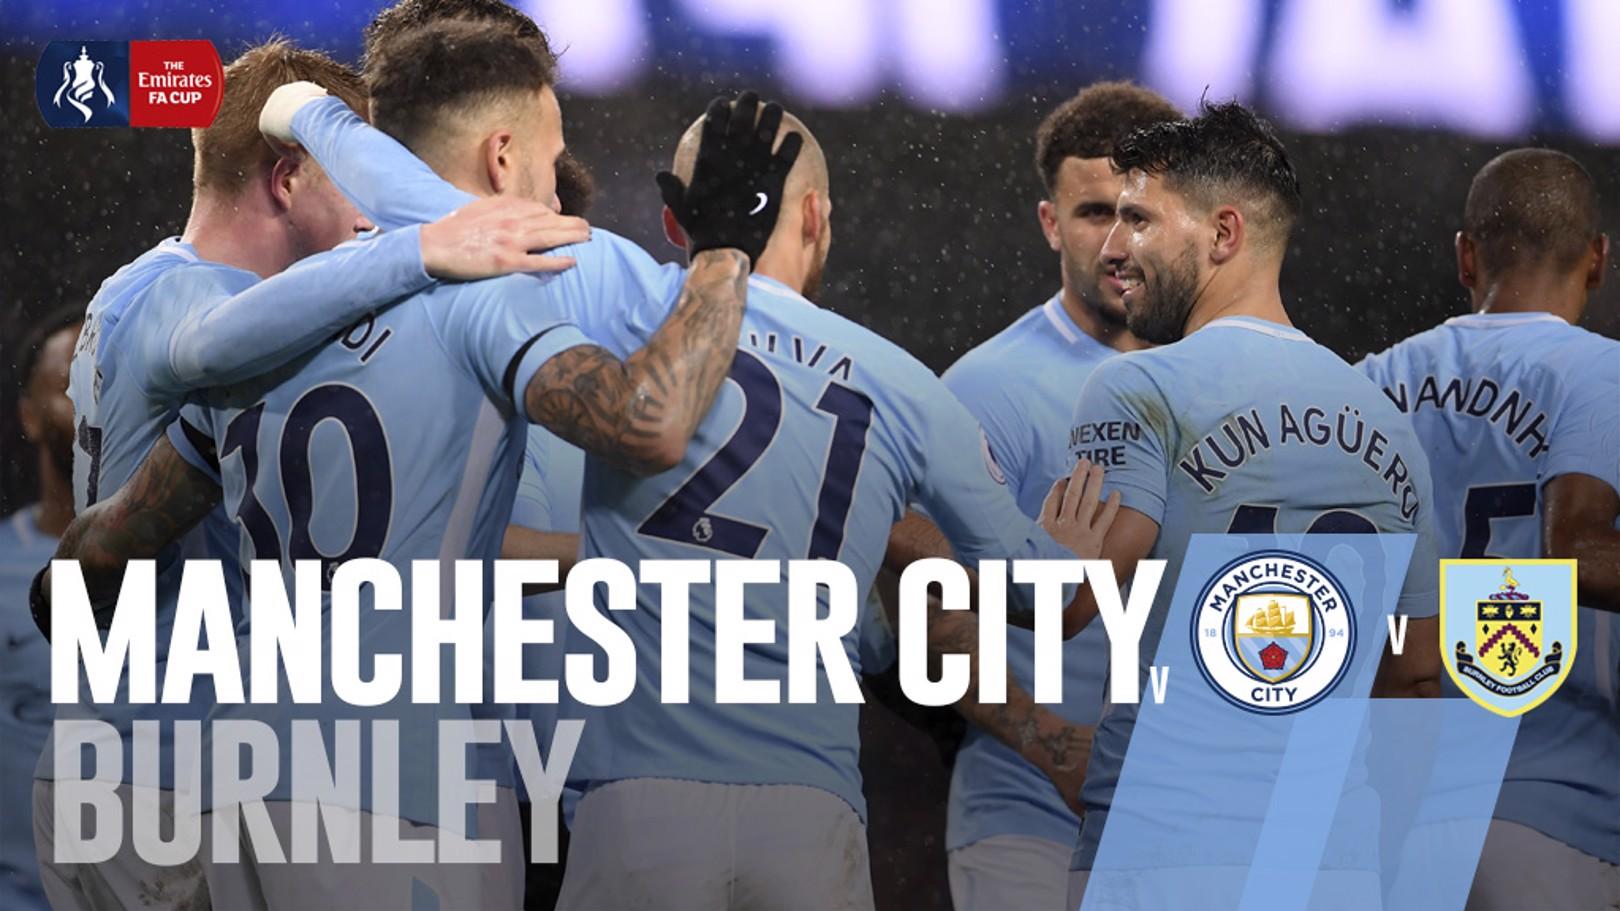 Man City x Burnley